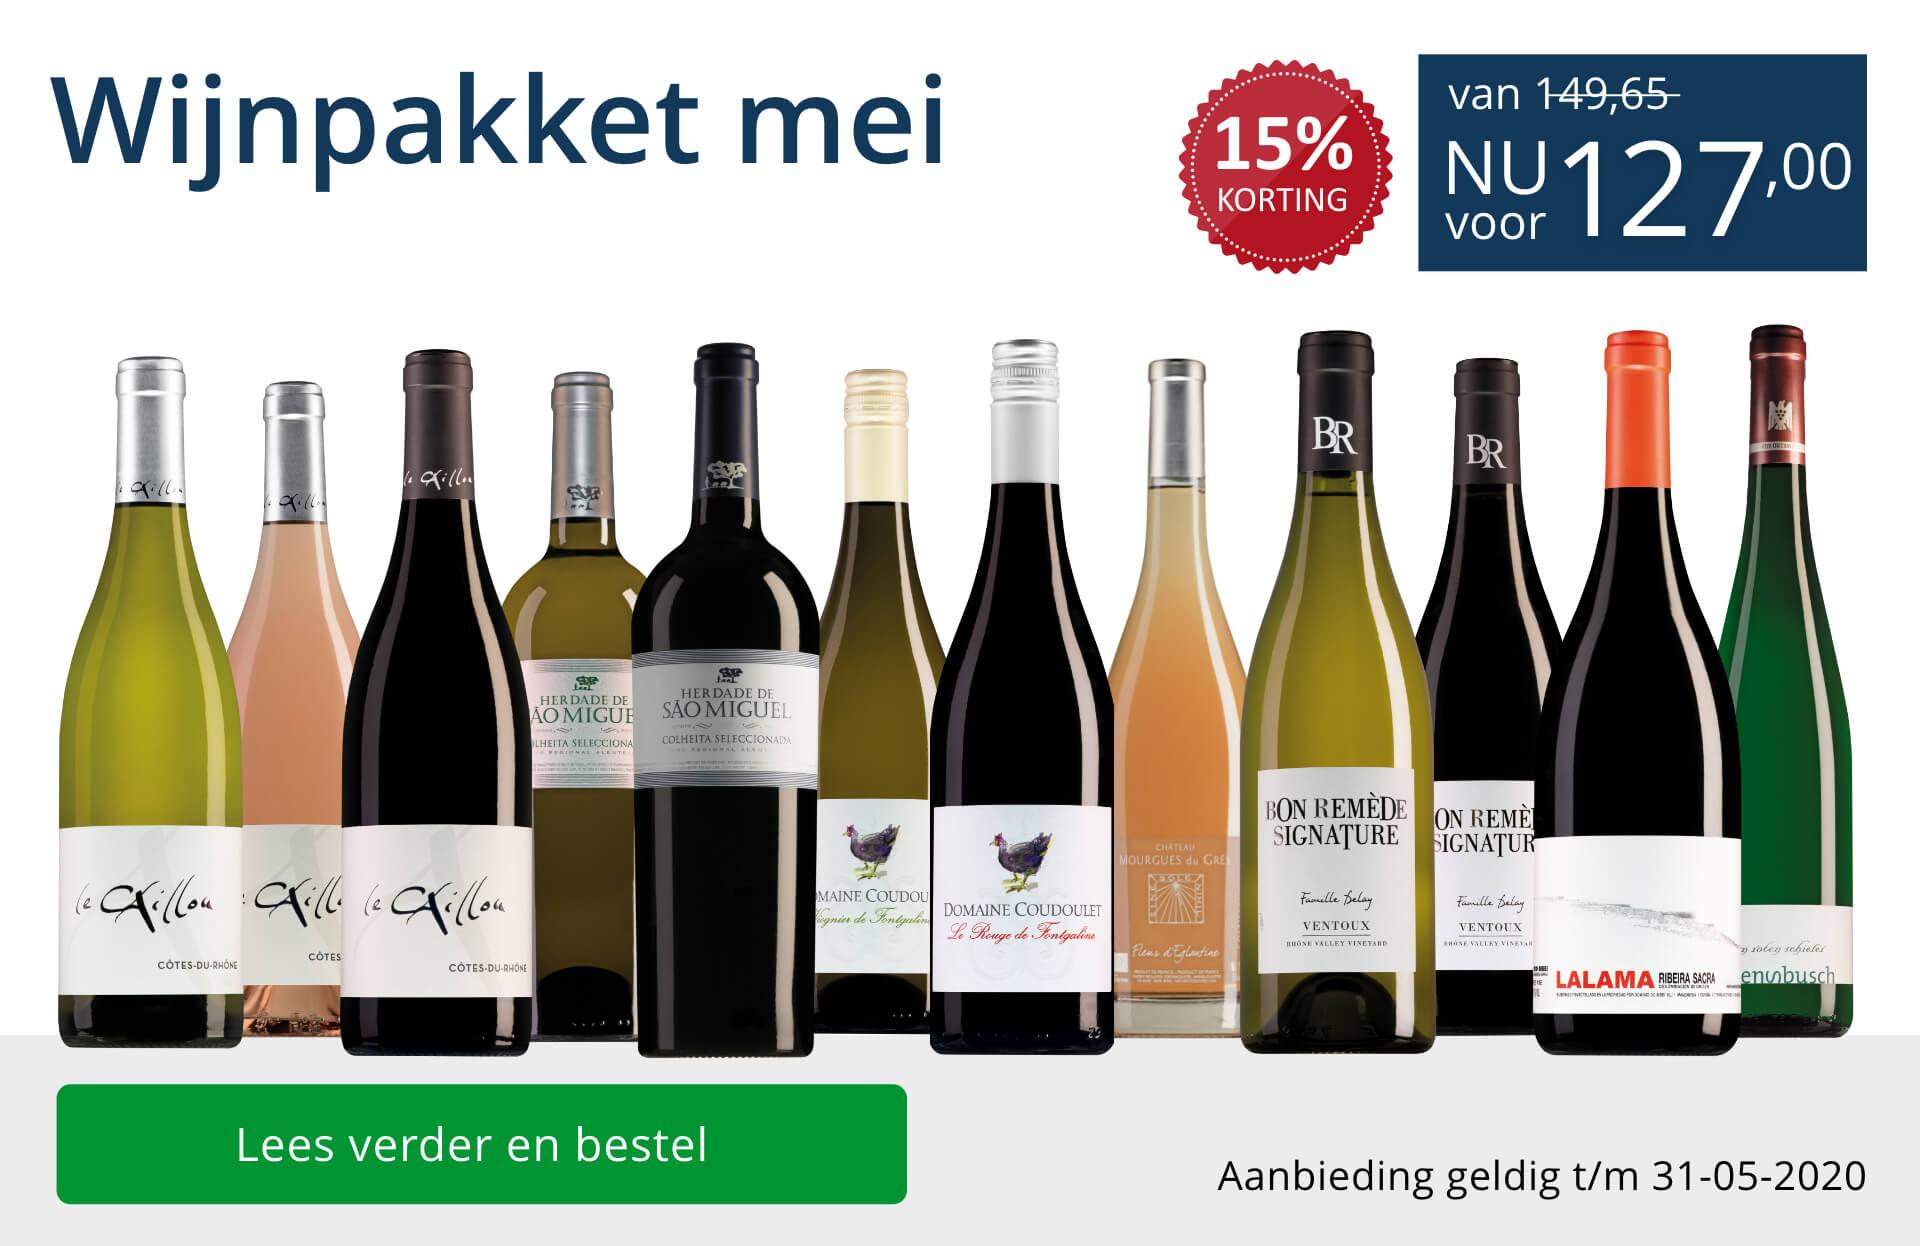 Wijnpakket wijnbericht mei 2020 (127,00) - blauw